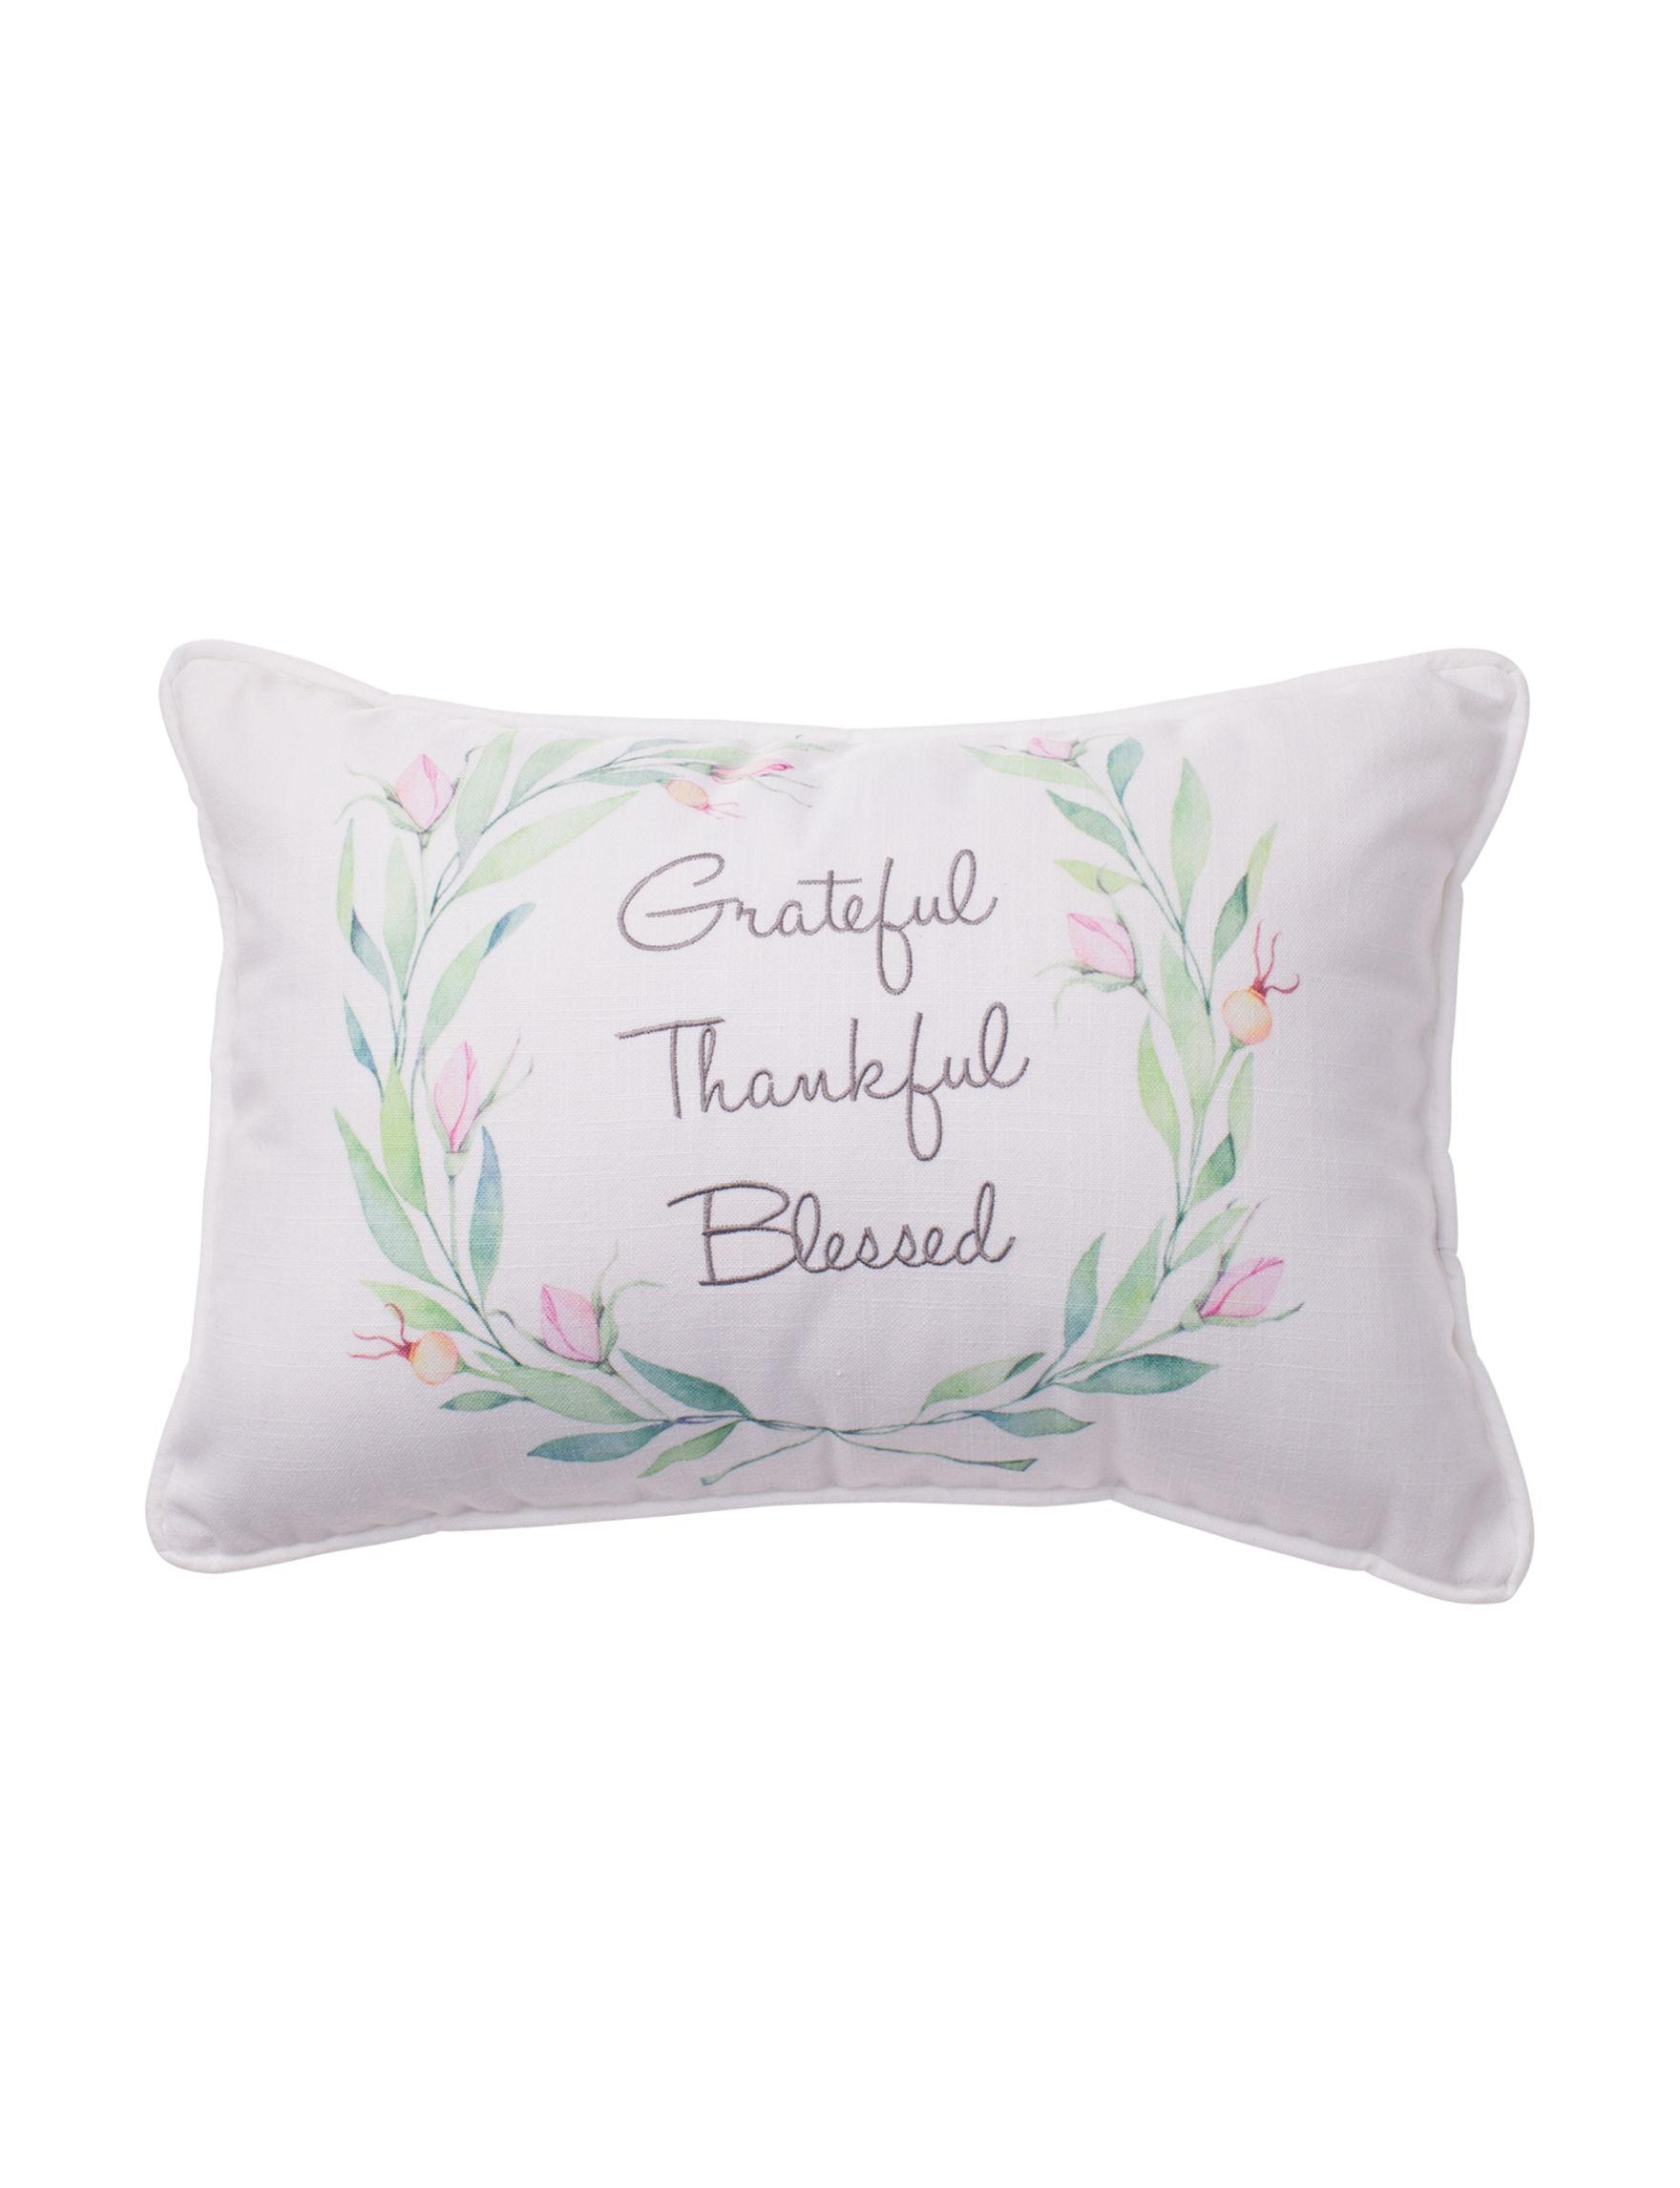 Deco White Decorative Pillows